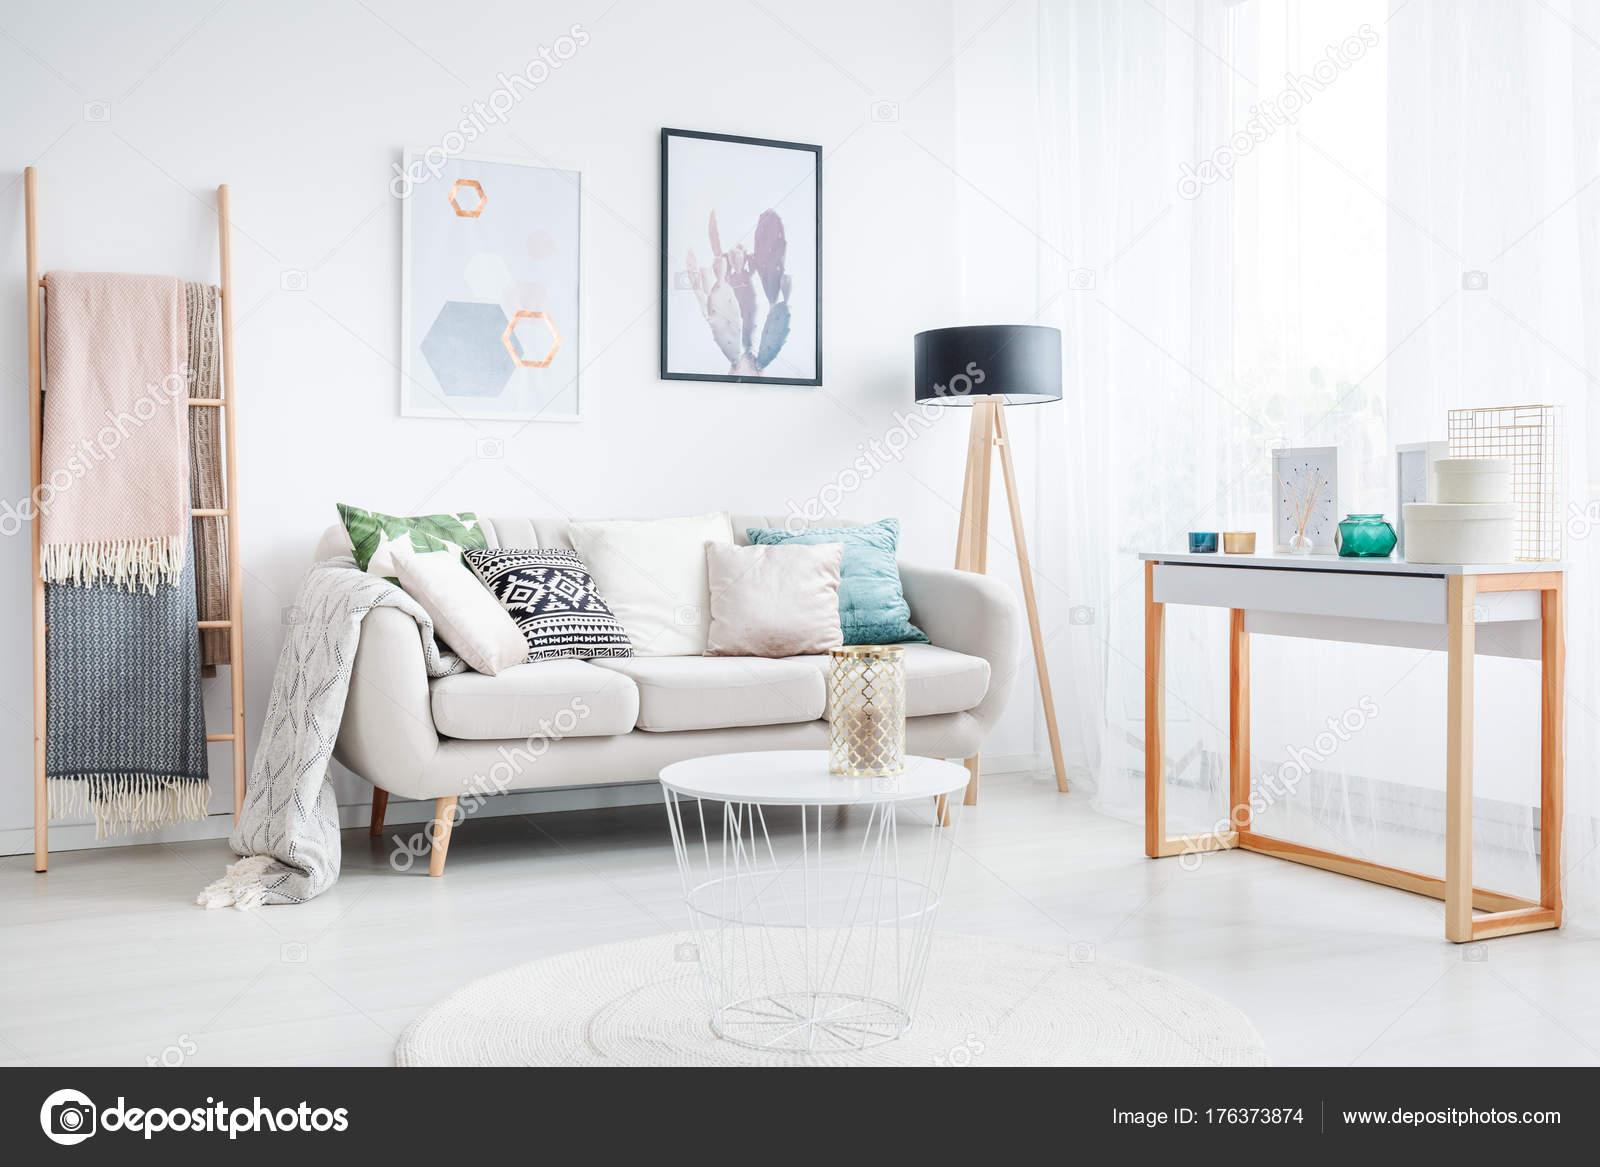 https://st3.depositphotos.com/2249091/17637/i/1600/depositphotos_176373874-stockafbeelding-ladder-in-boheemse-woonkamer.jpg